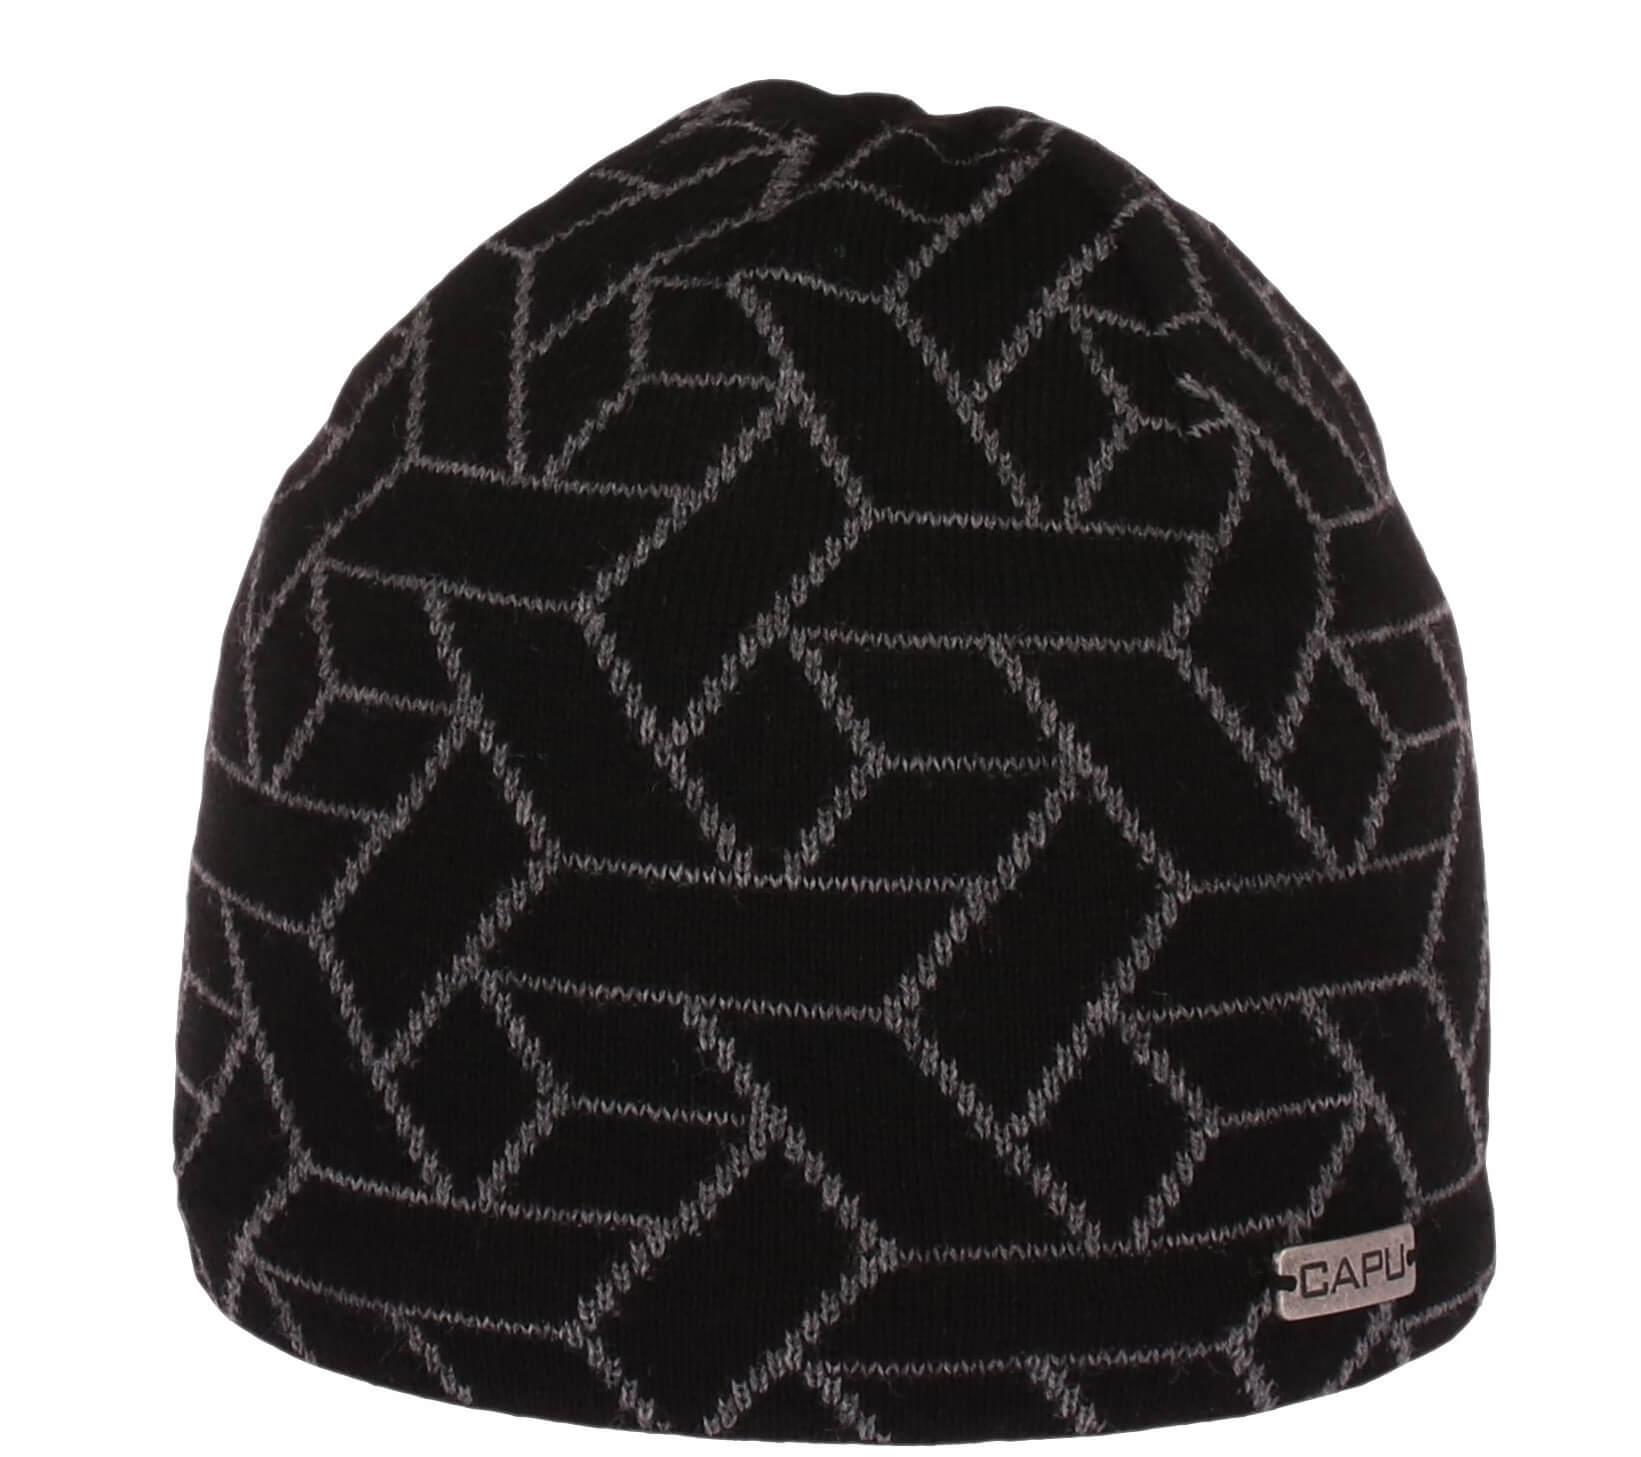 CAPU Téli kalap 1671-F Grey  544bbb064e